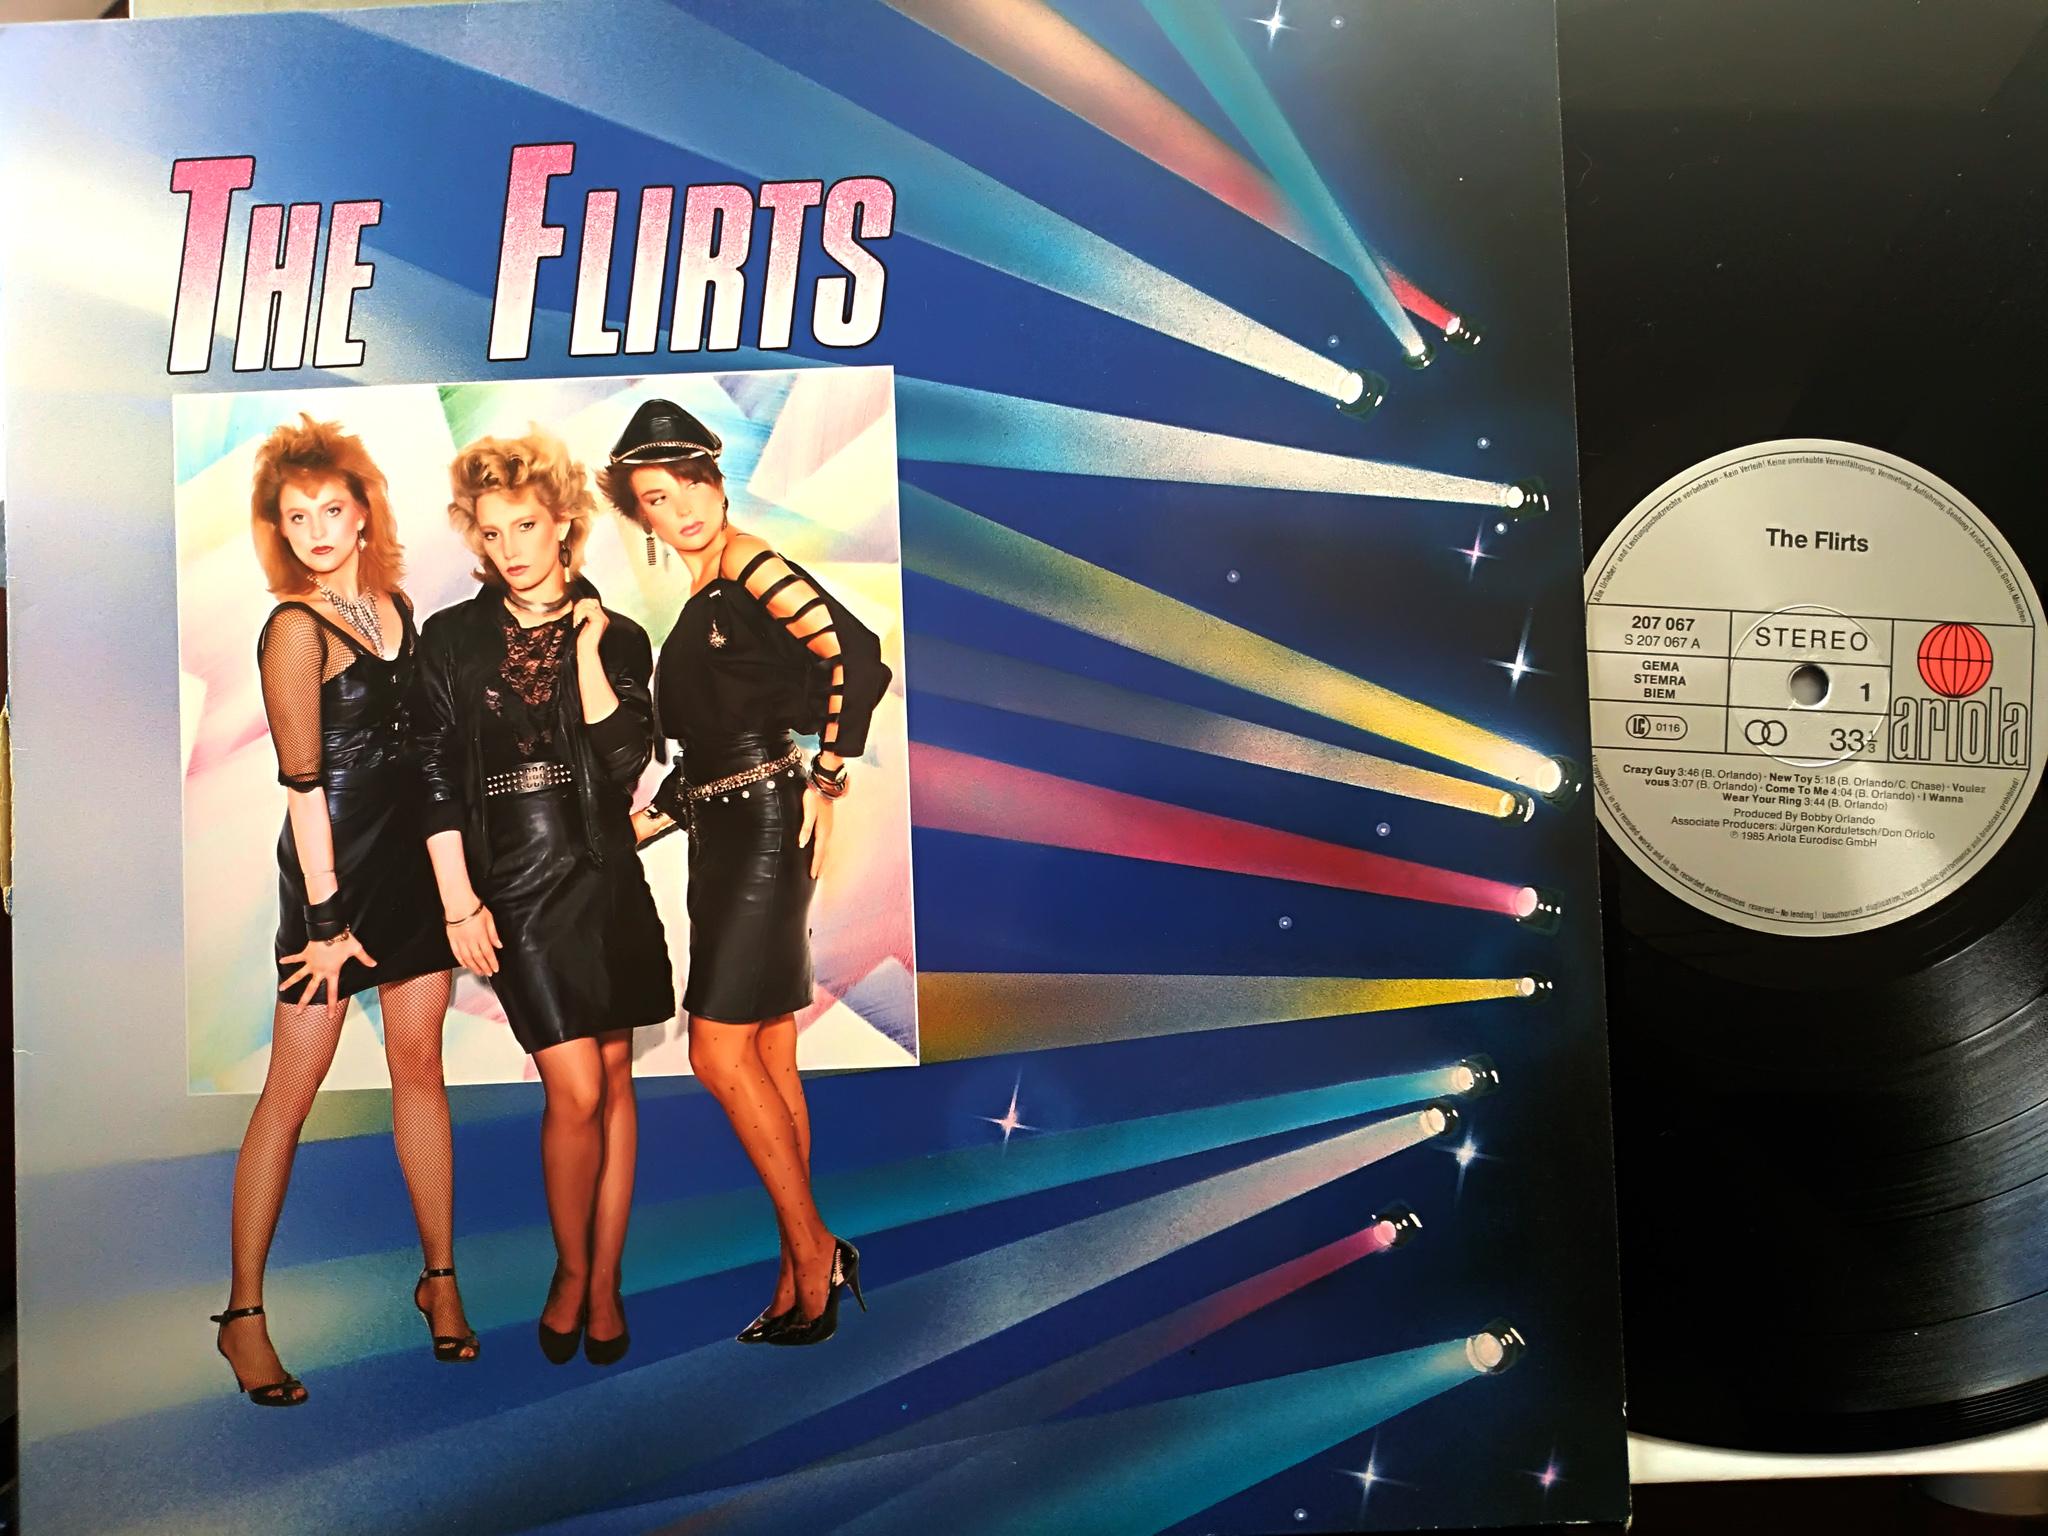 The Flirts - The Flirts LP